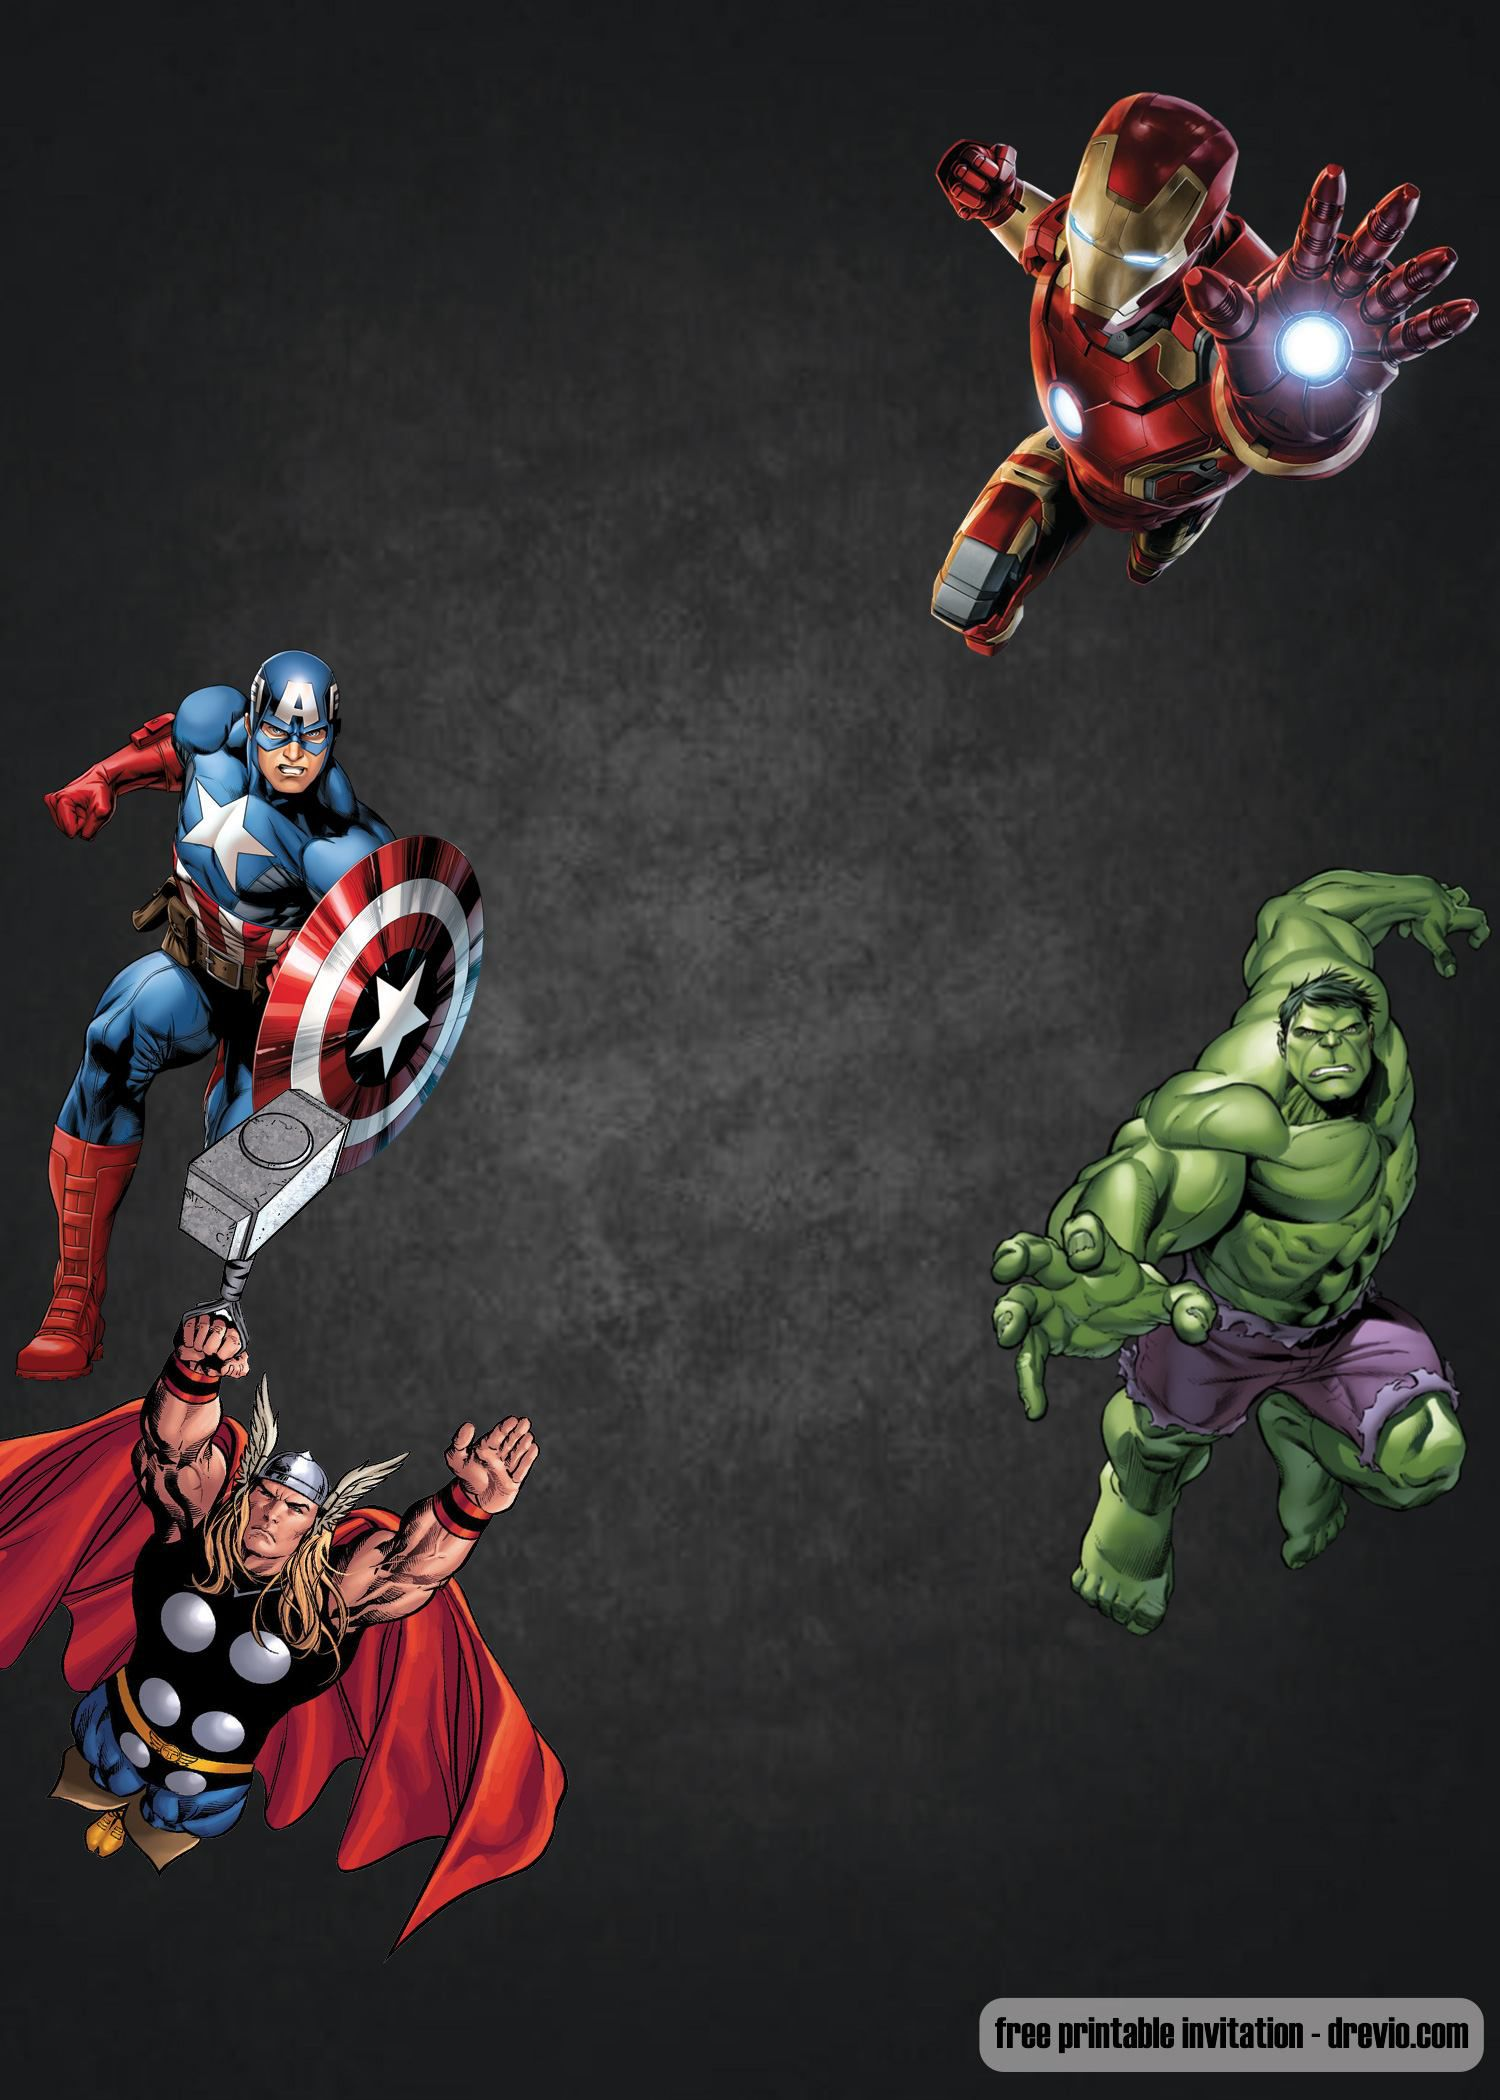 006 Phenomenal Superhero Birthday Invitation Template Free Image Full